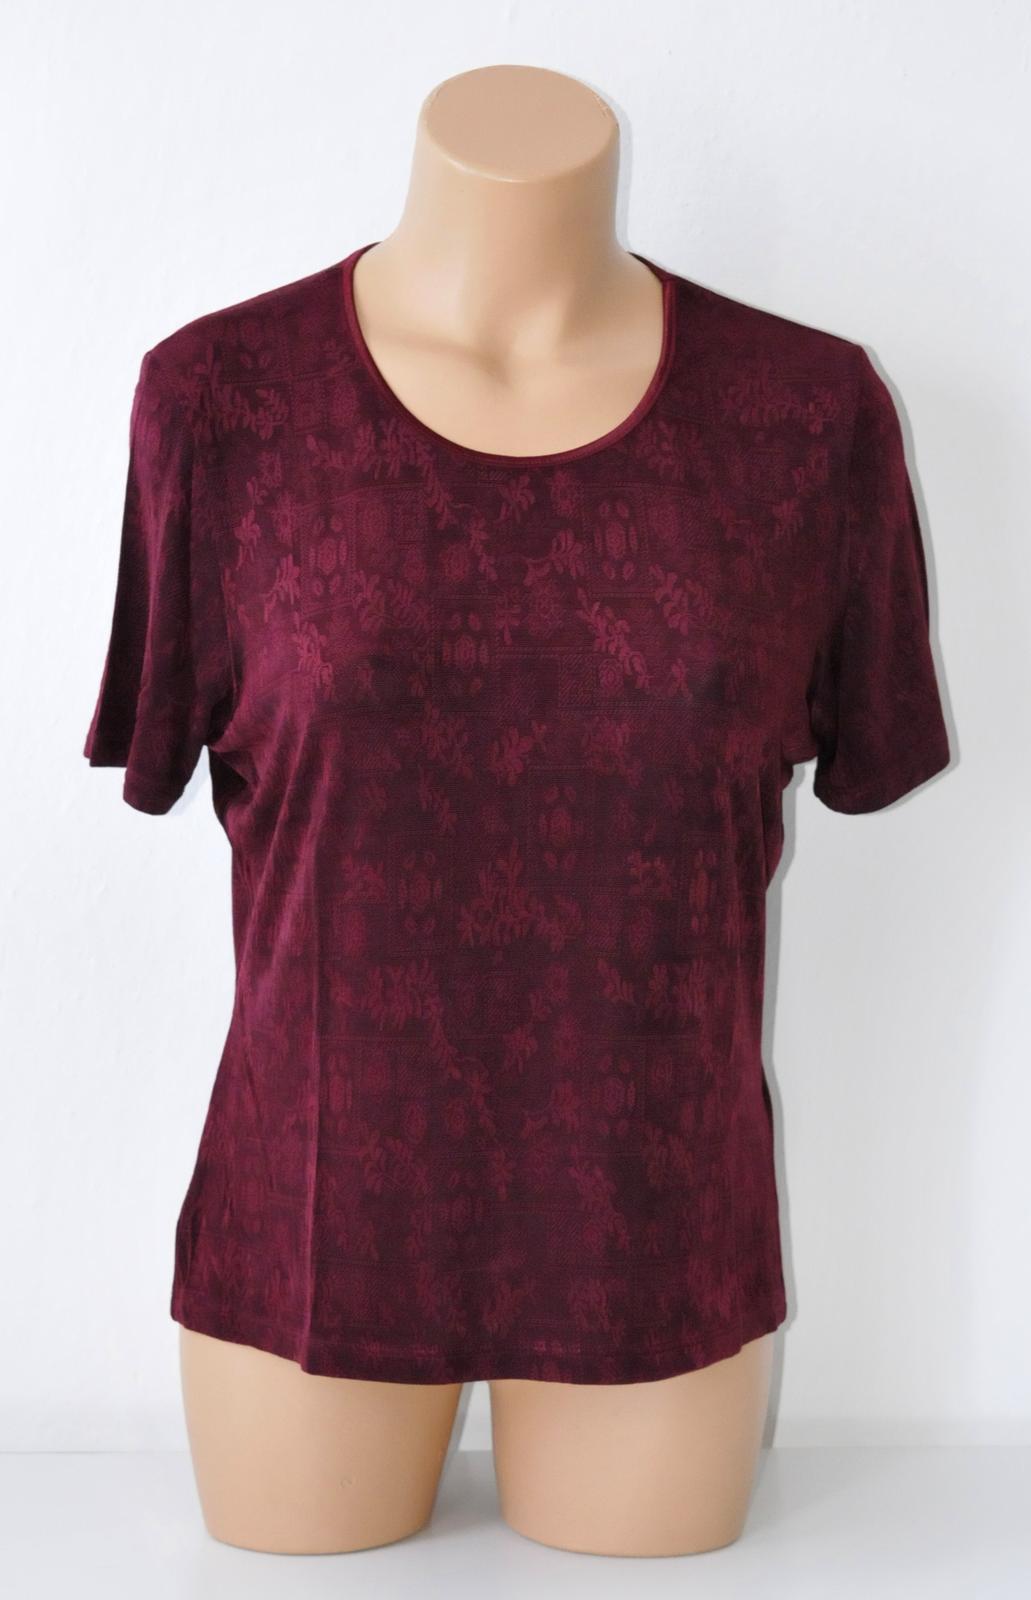 Dámske tričko - Obrázok č. 1